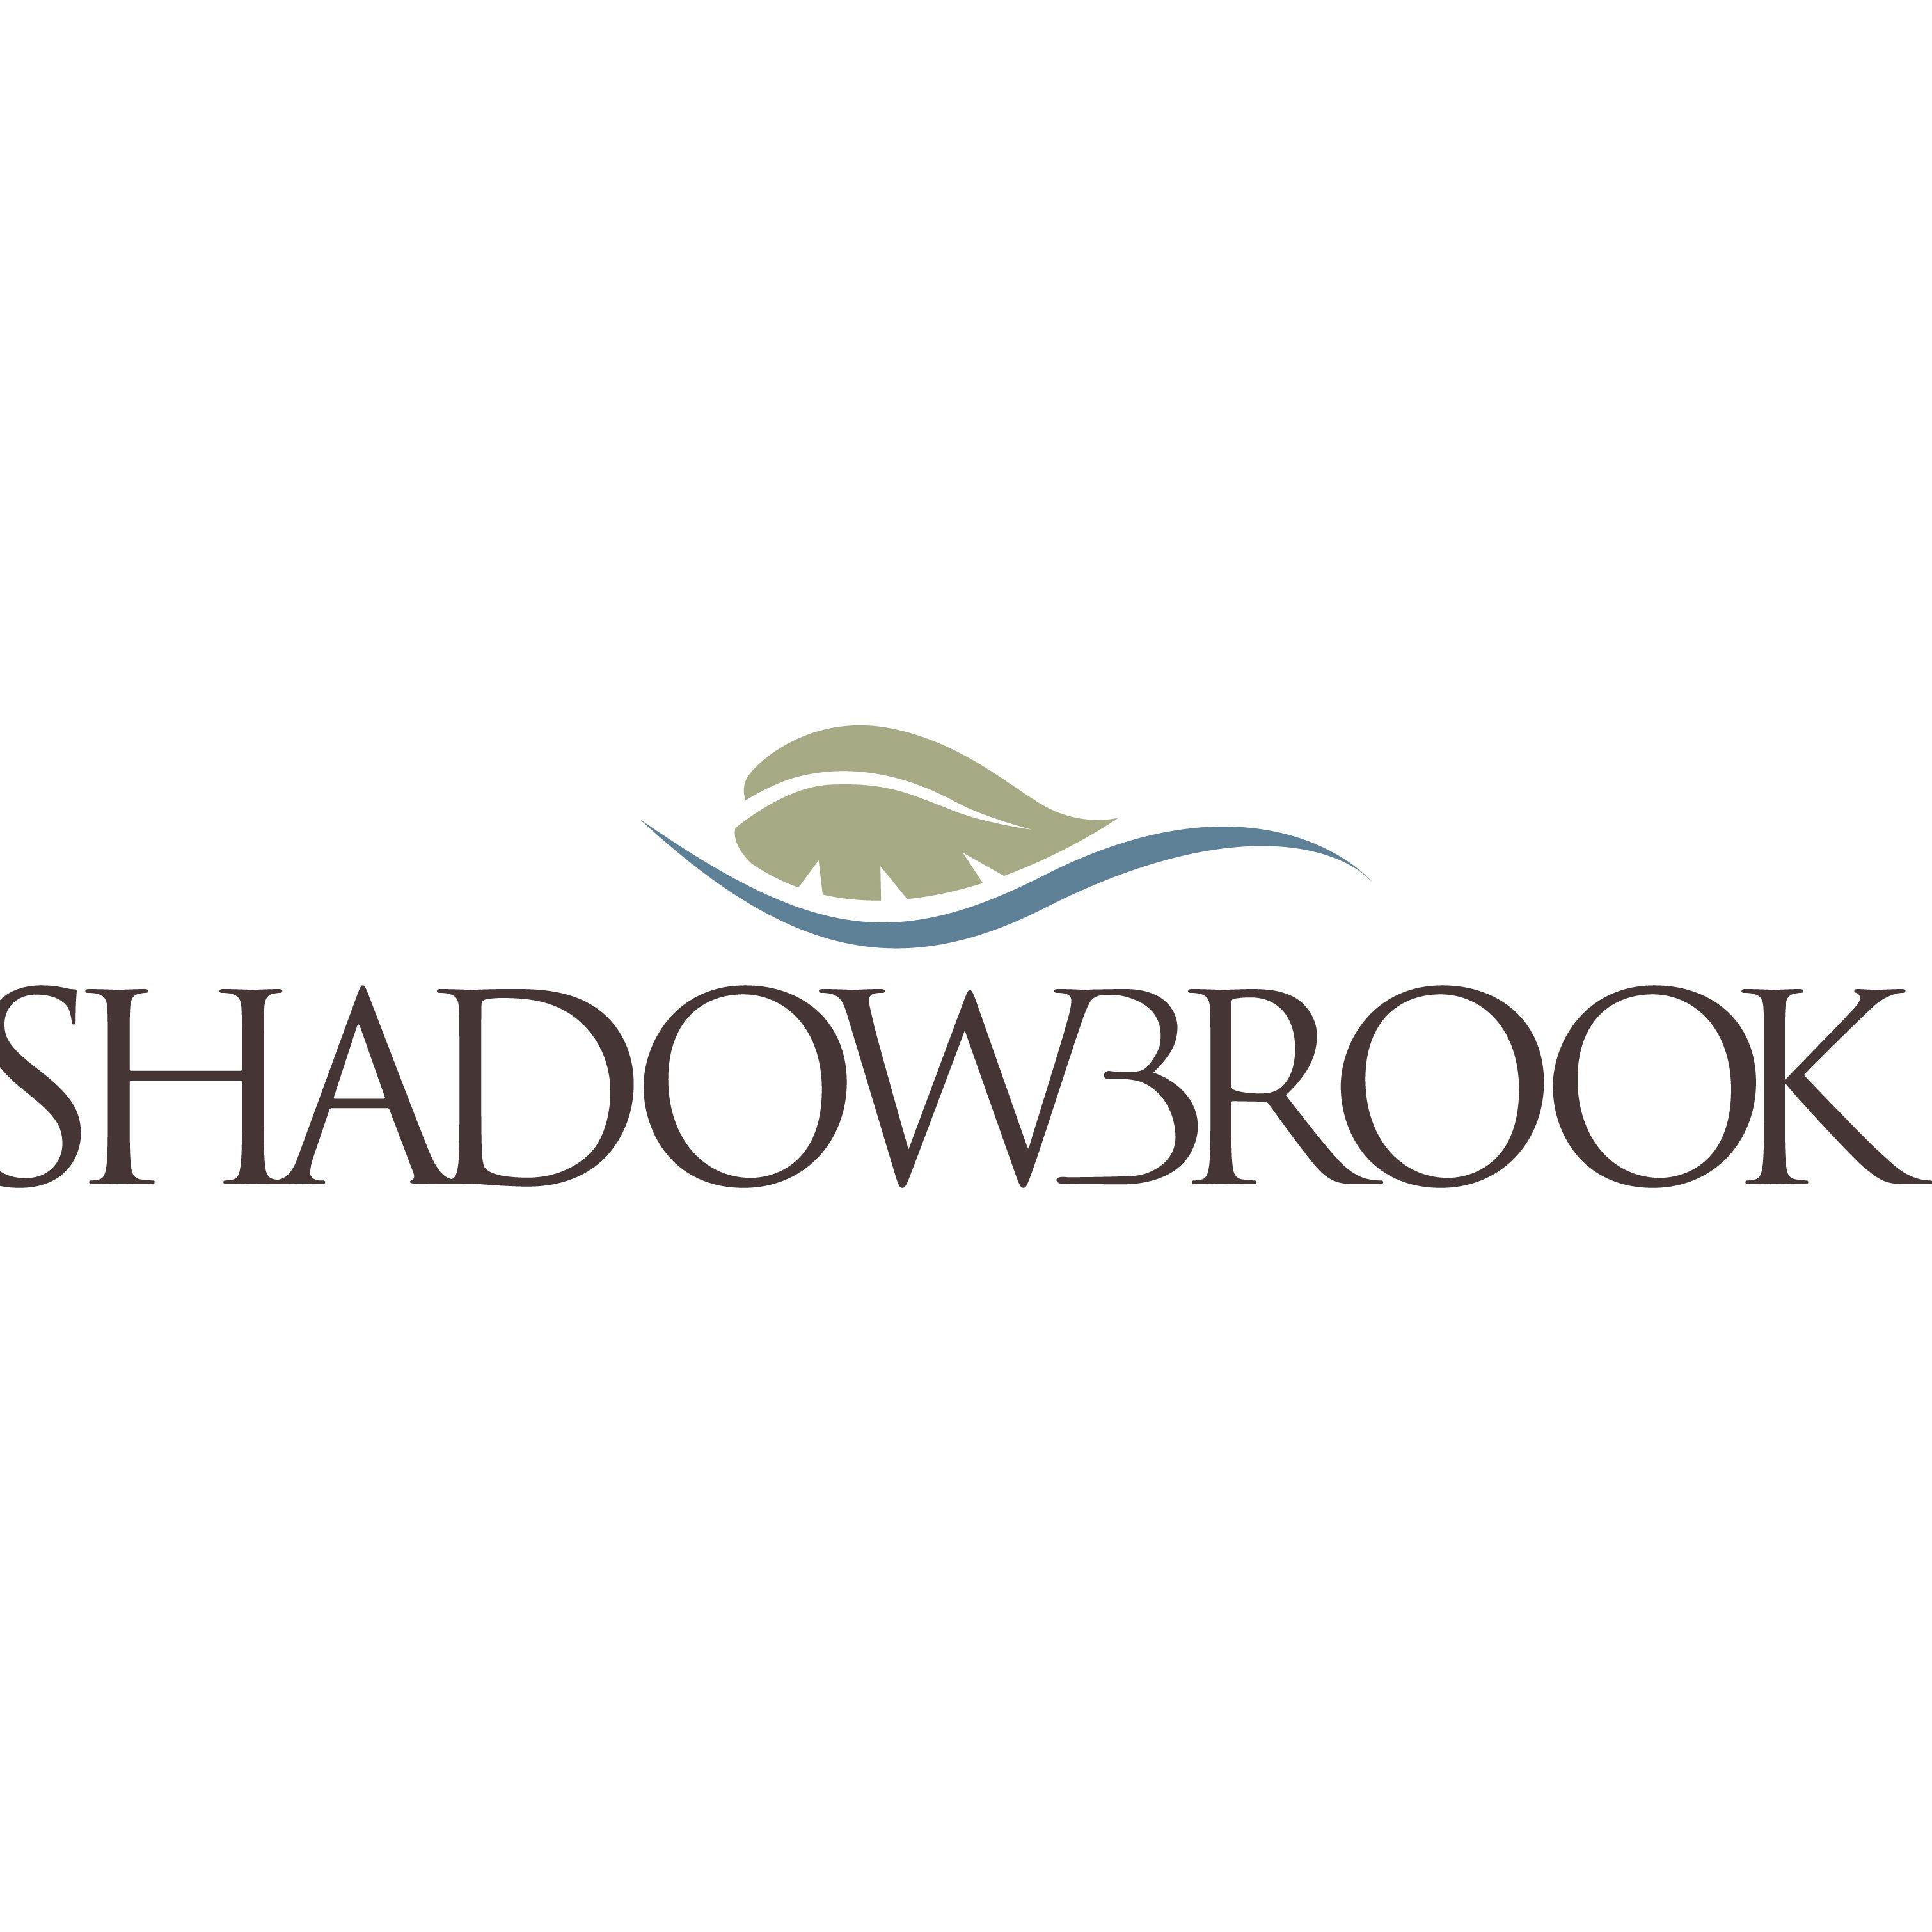 Shadowbrook Crossing